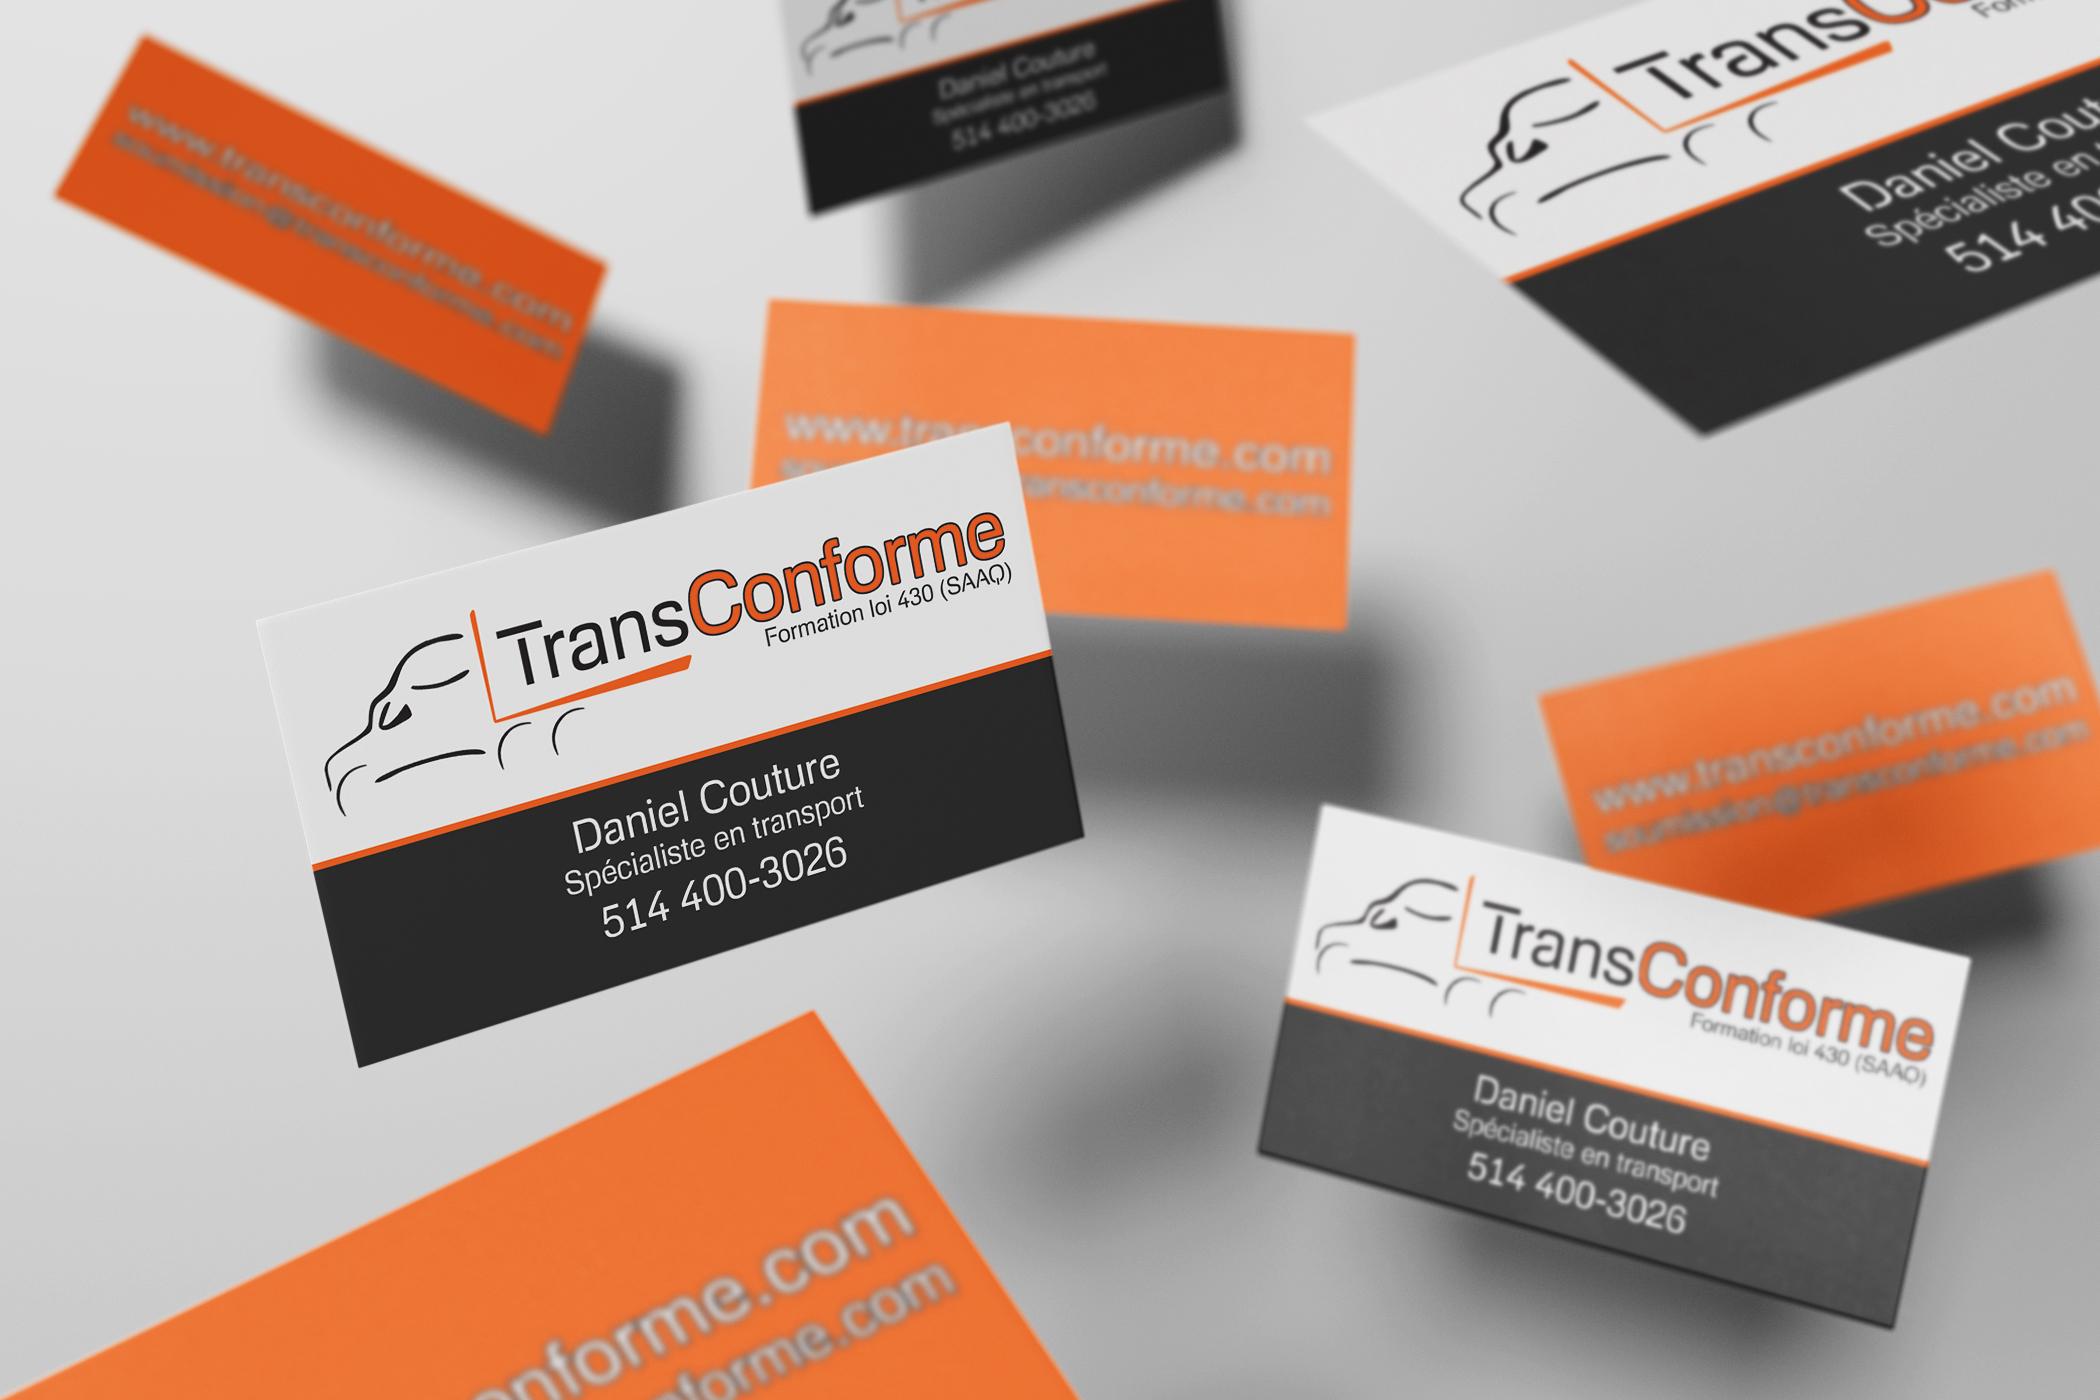 TransConforme